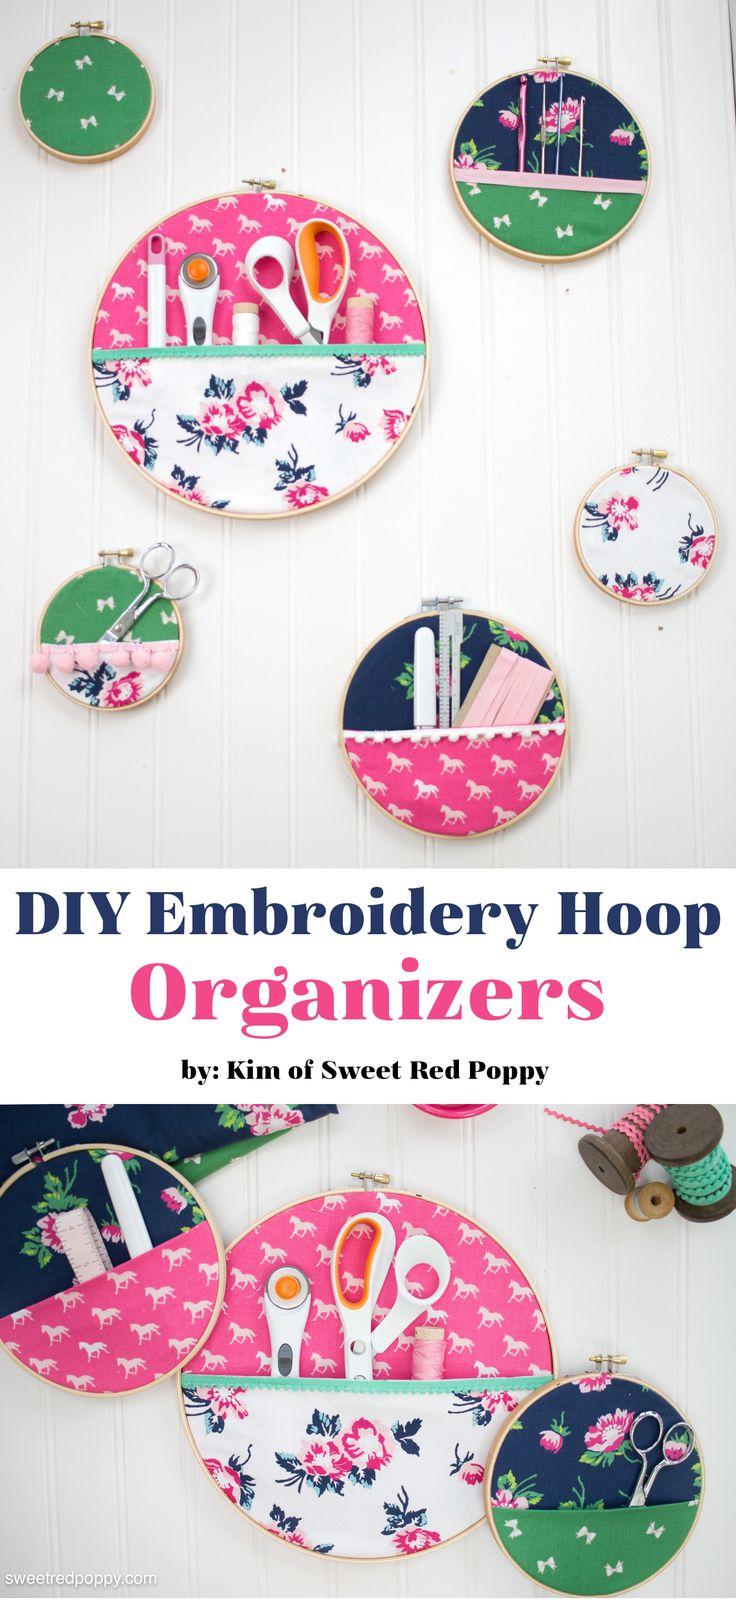 Best Diy Crafts Ideas Diy Embroidery Hoop Hanging Wall Organizer A Great Idea For Sewing Room Organi Diy Loop Leading Diy Craft Inspiration Magazine Database